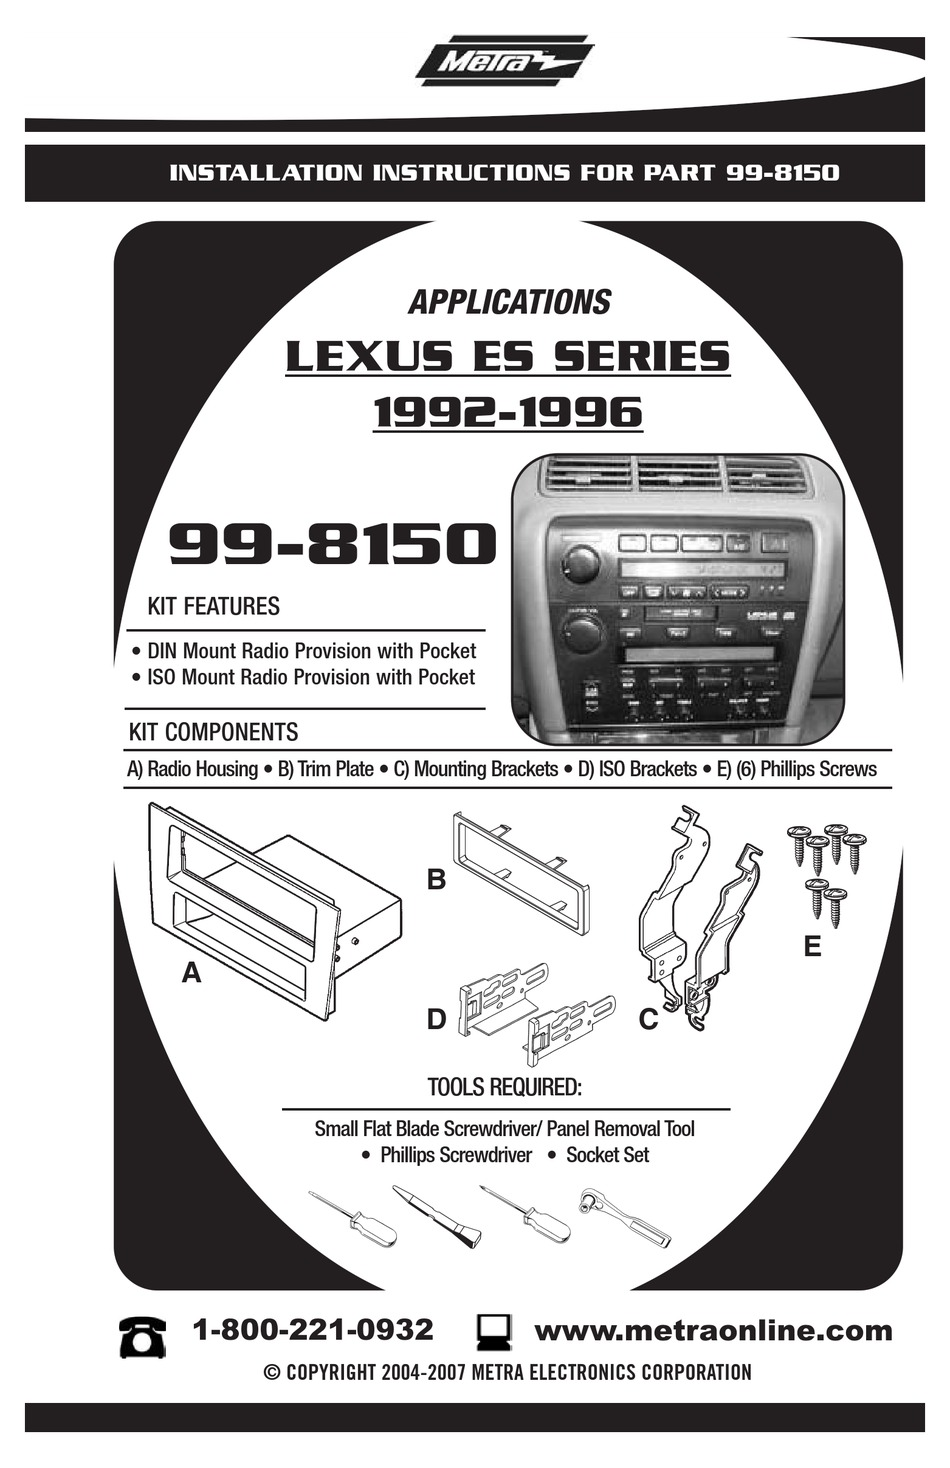 METRA ELECTRONICS LEXUS 99-8150 INSTALLATION INSTRUCTIONS